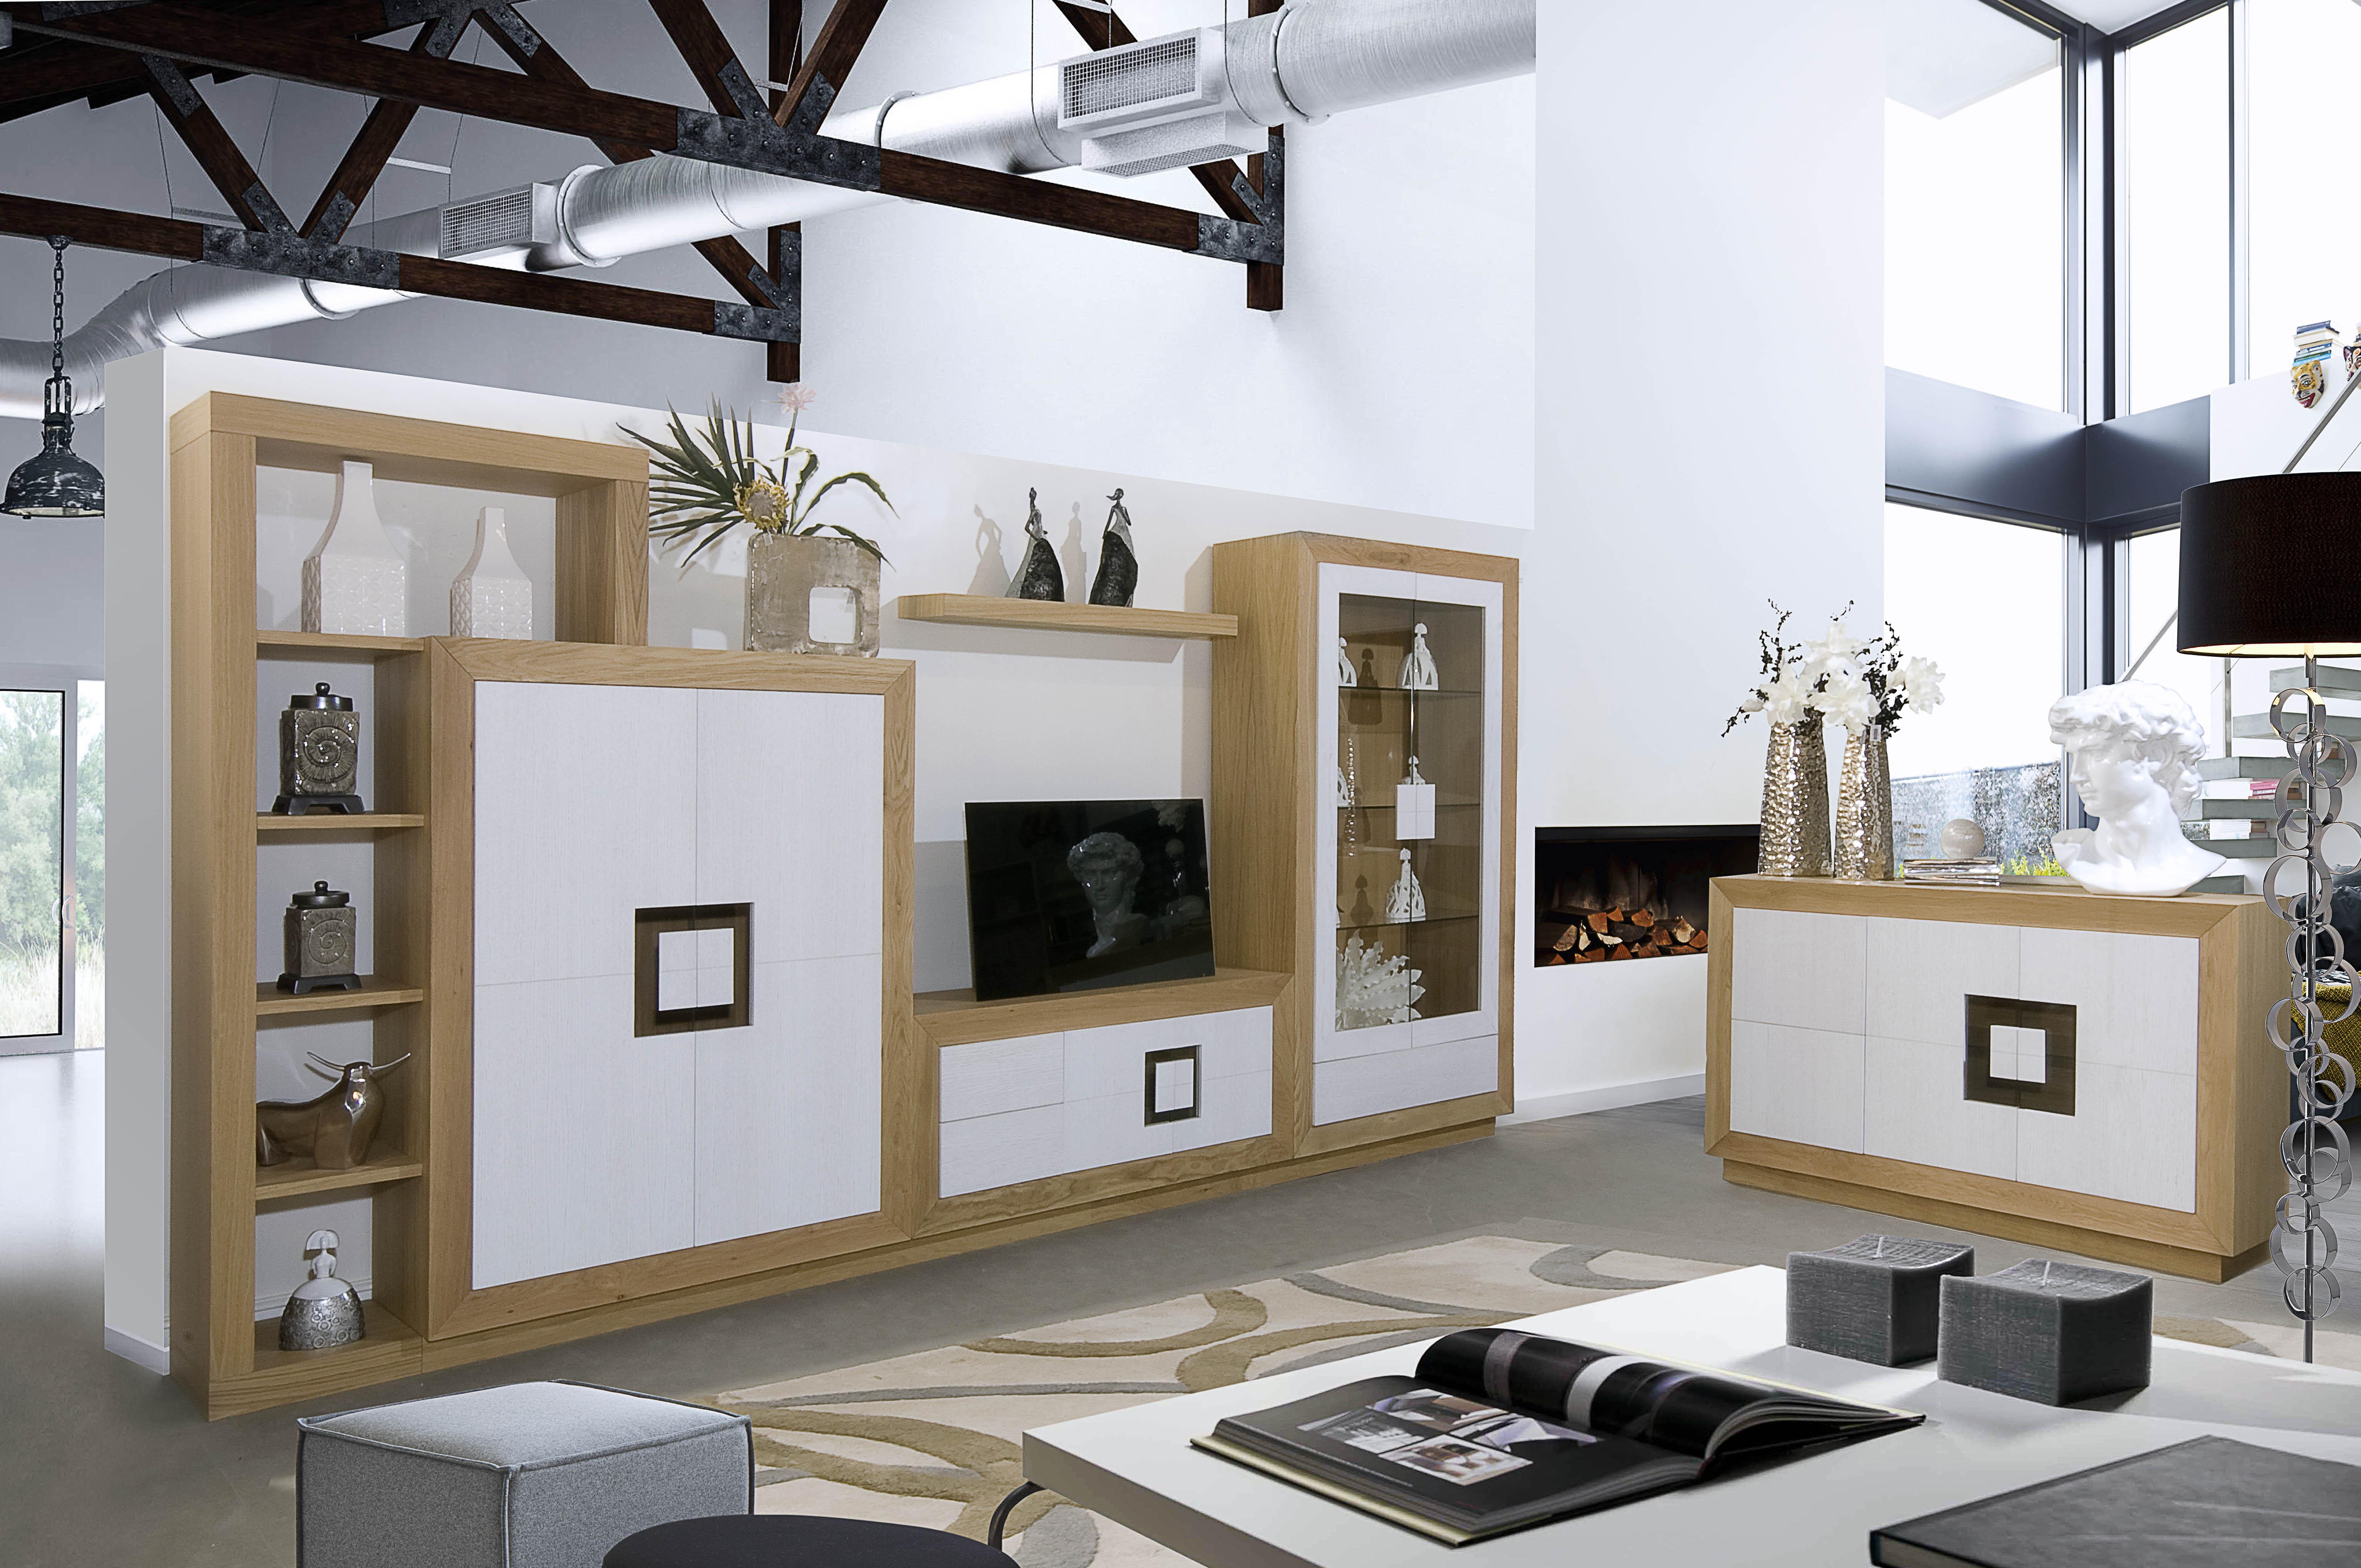 Muebles Salon A Medida 3id6 Muebles De Salà N Coleccià N Valeria Fabricado En Roble Muebles En